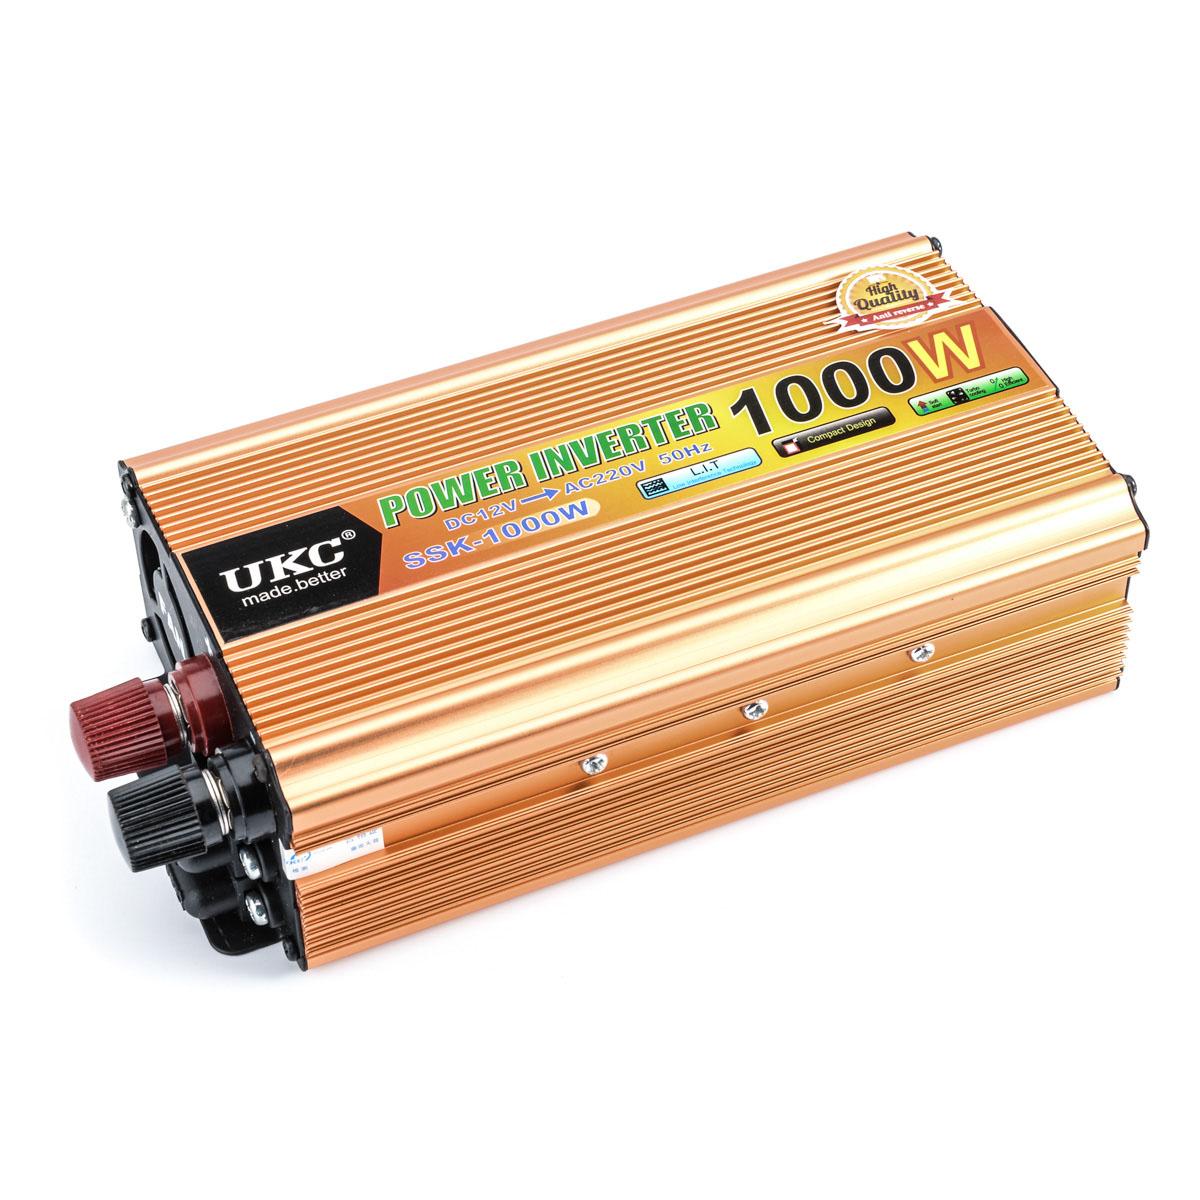 Car inverter 1000W 12V 220V DC 12 v to AC 220 v vehicle power supply switch on-board charger inverter Adapter Converter CY177-CN(China (Mainland))